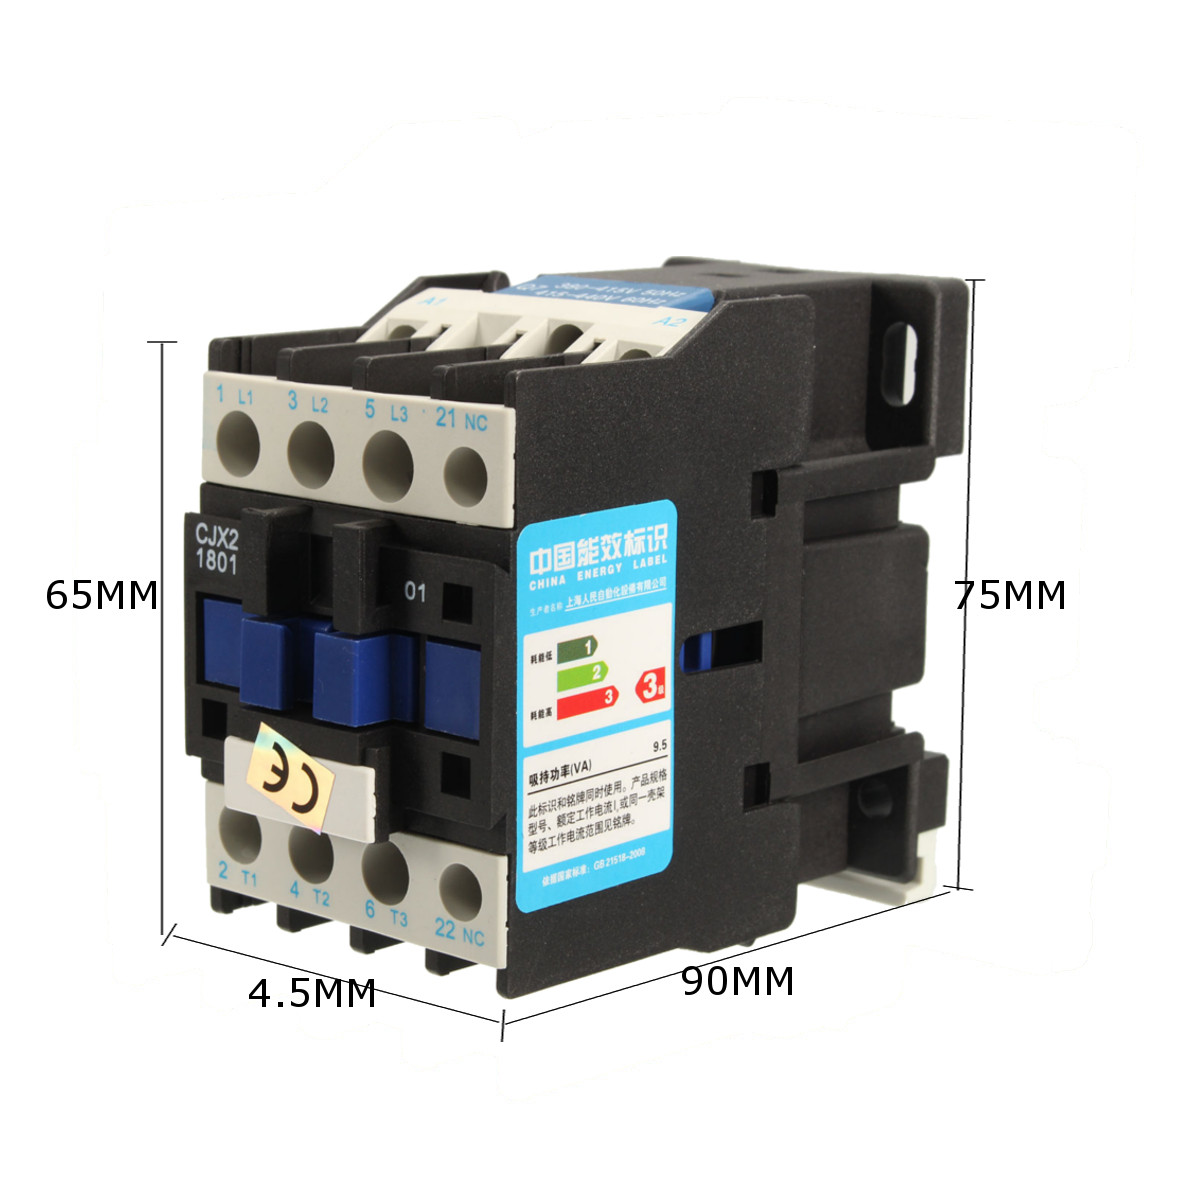 Cjx2 1801 Ac 220v 380v 18a Contactor Motor Starter Relay 3